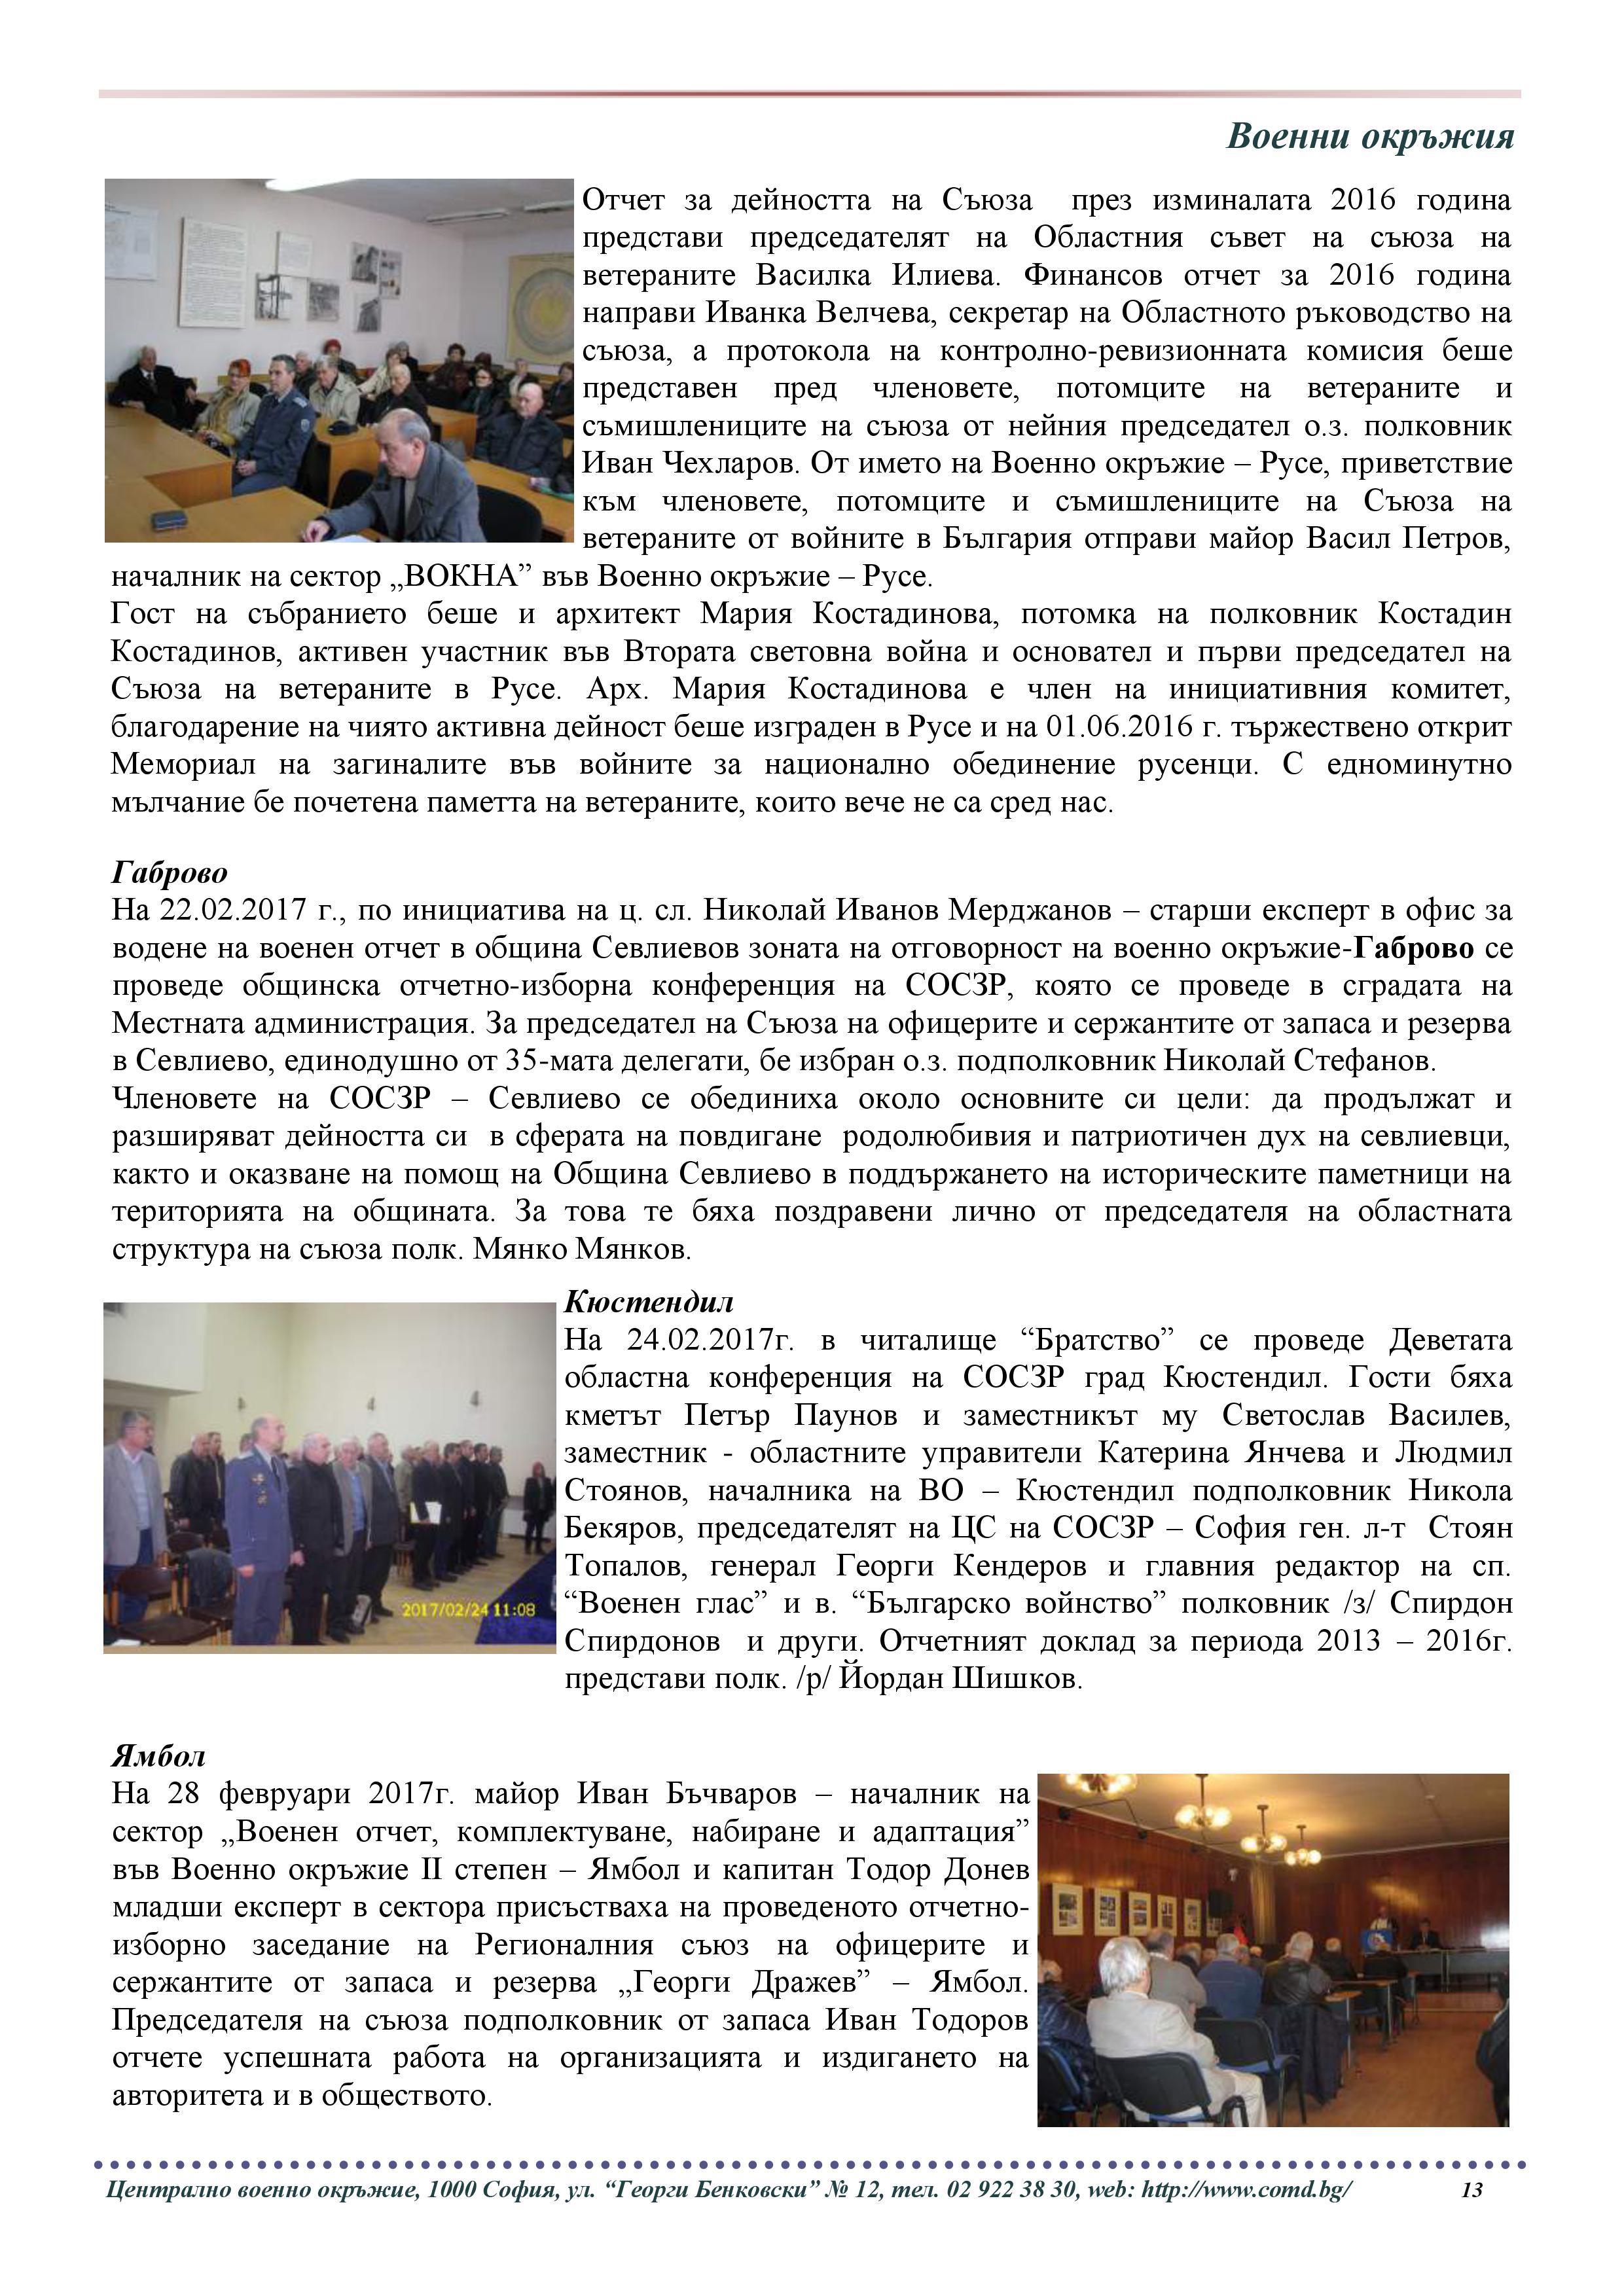 http://armymedia.bg/wp-content/uploads/2015/06/IB_2_2017g.compressed-za-izpra6tane-22.03.2017.page13.jpg